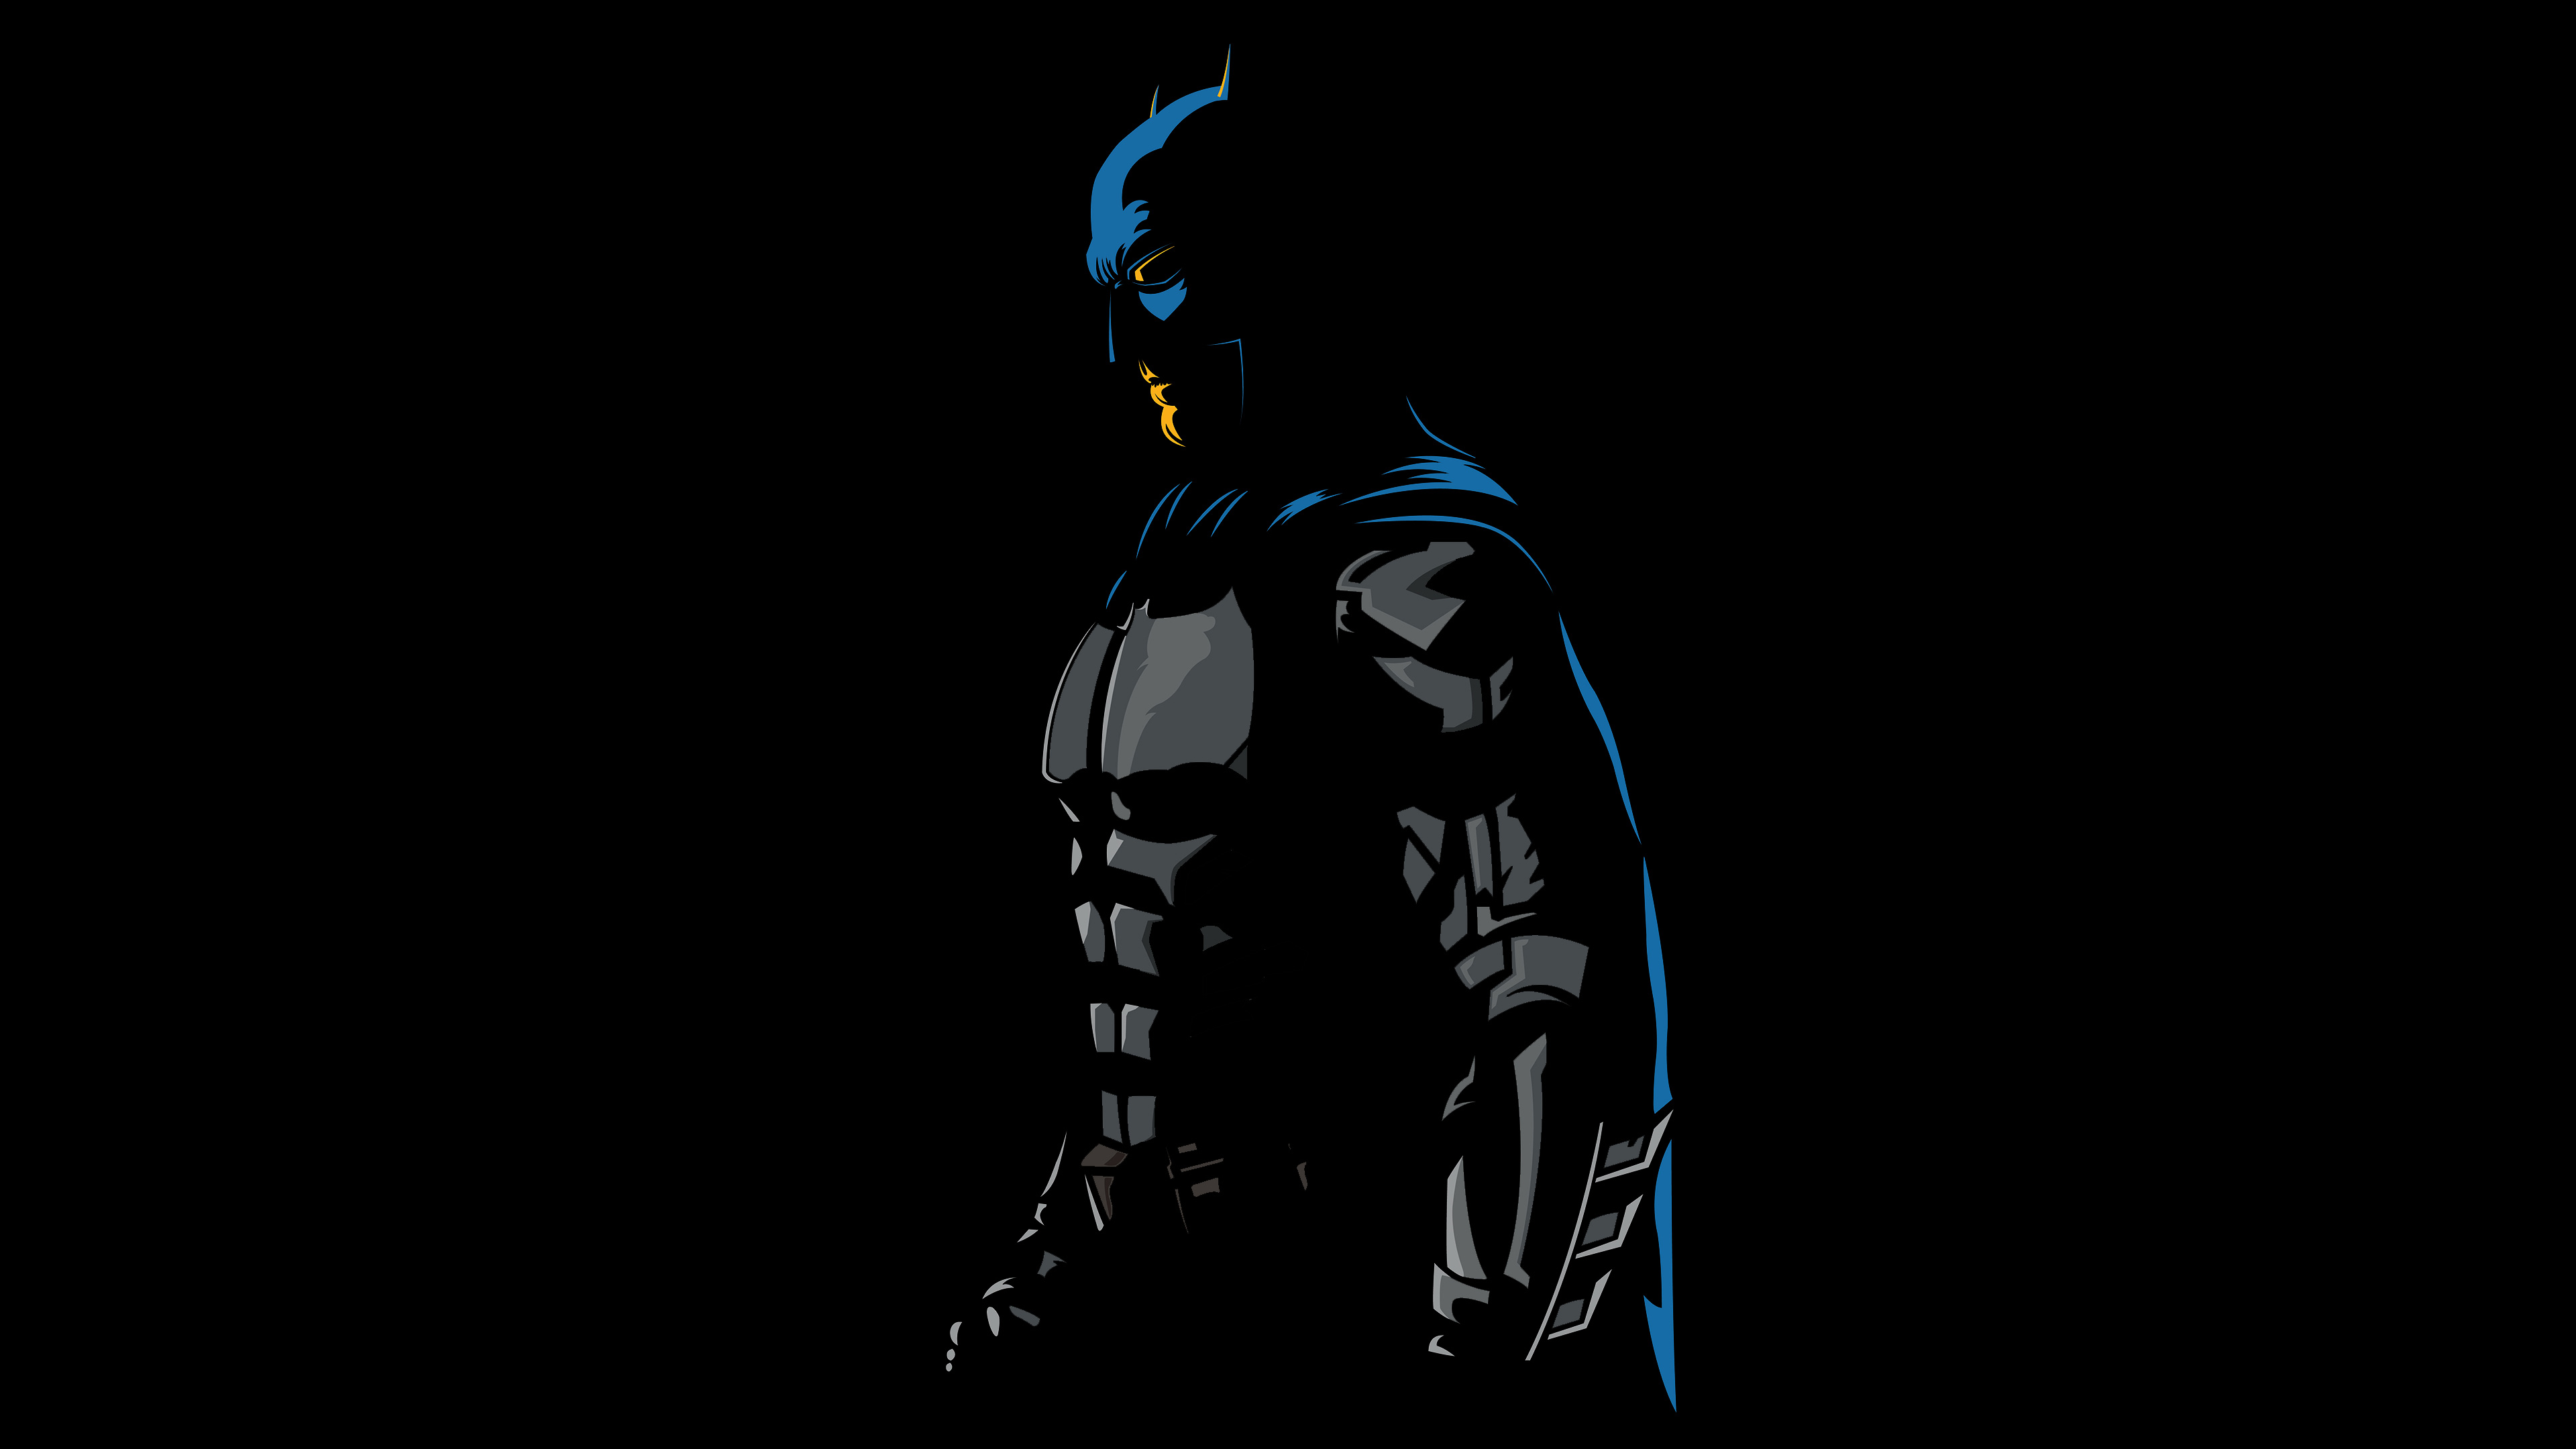 Batman 4k Minimalism Artwork, HD Superheroes, 4k Wallpapers, Images, Backgrounds, Photos and